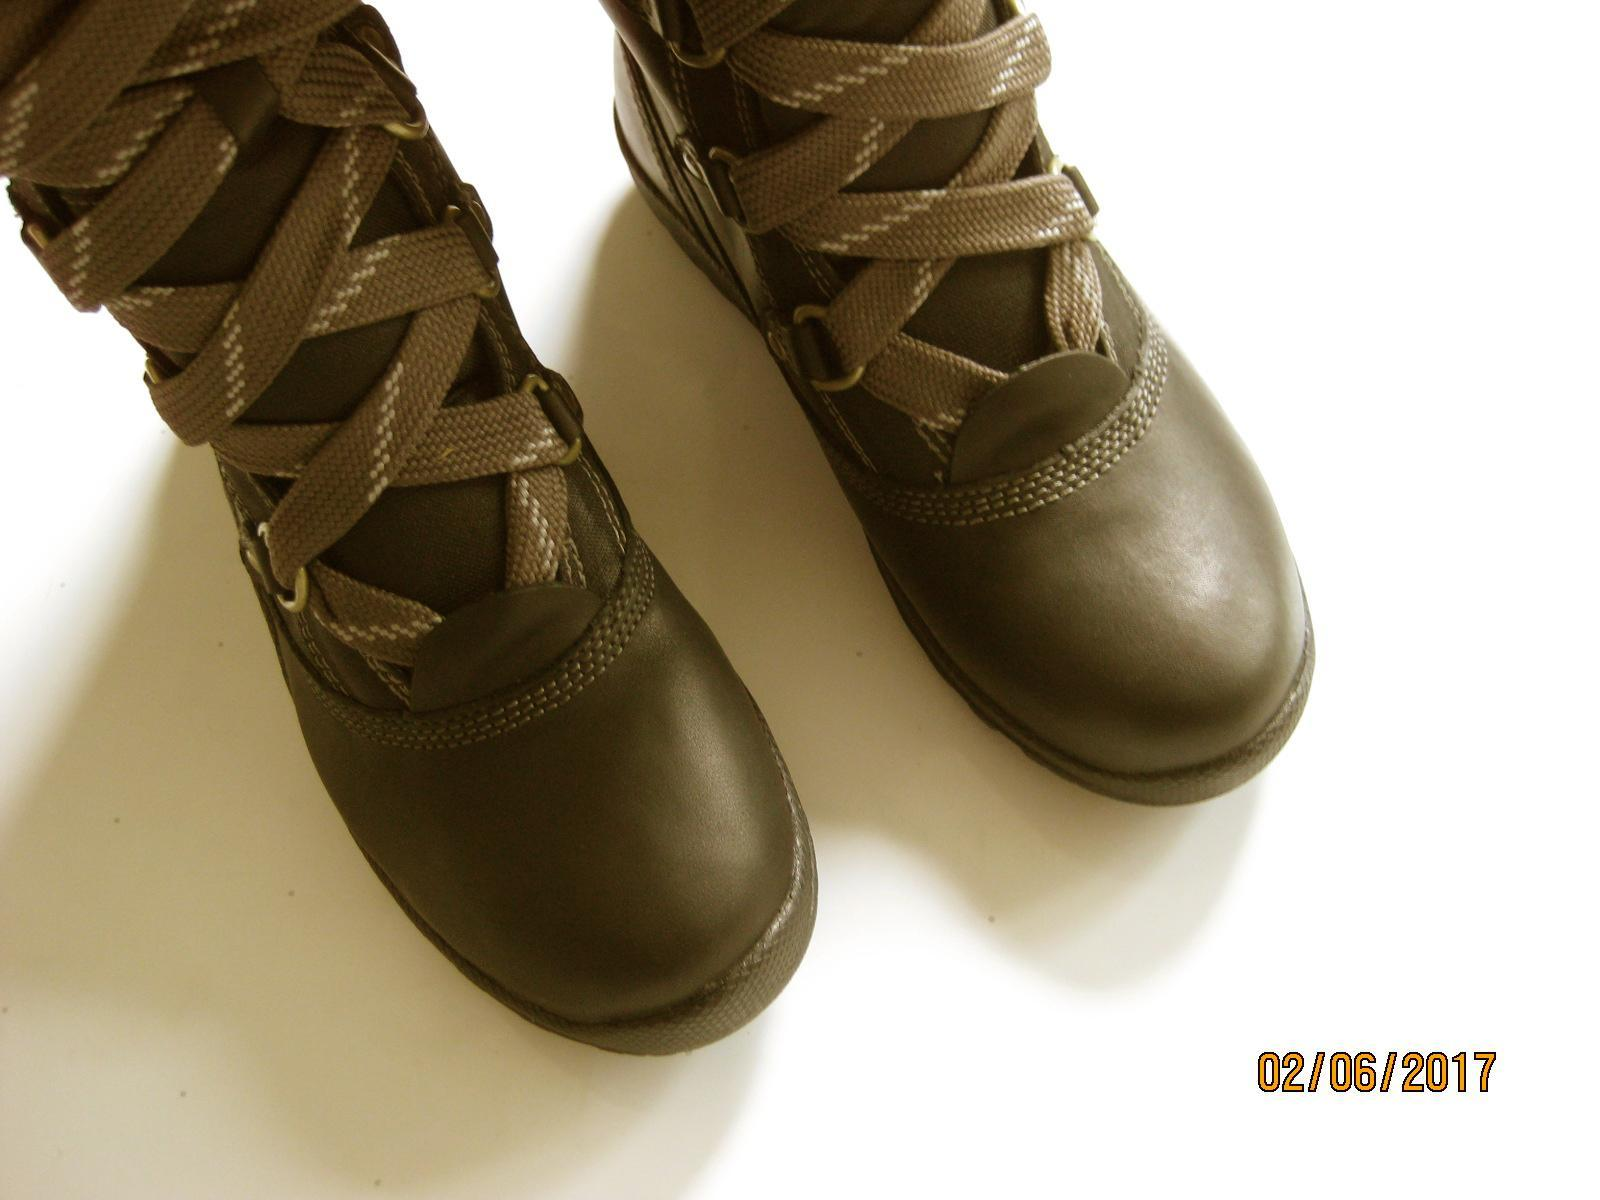 Timberland Ek Mount Hope Leather and Fabric Waterproof